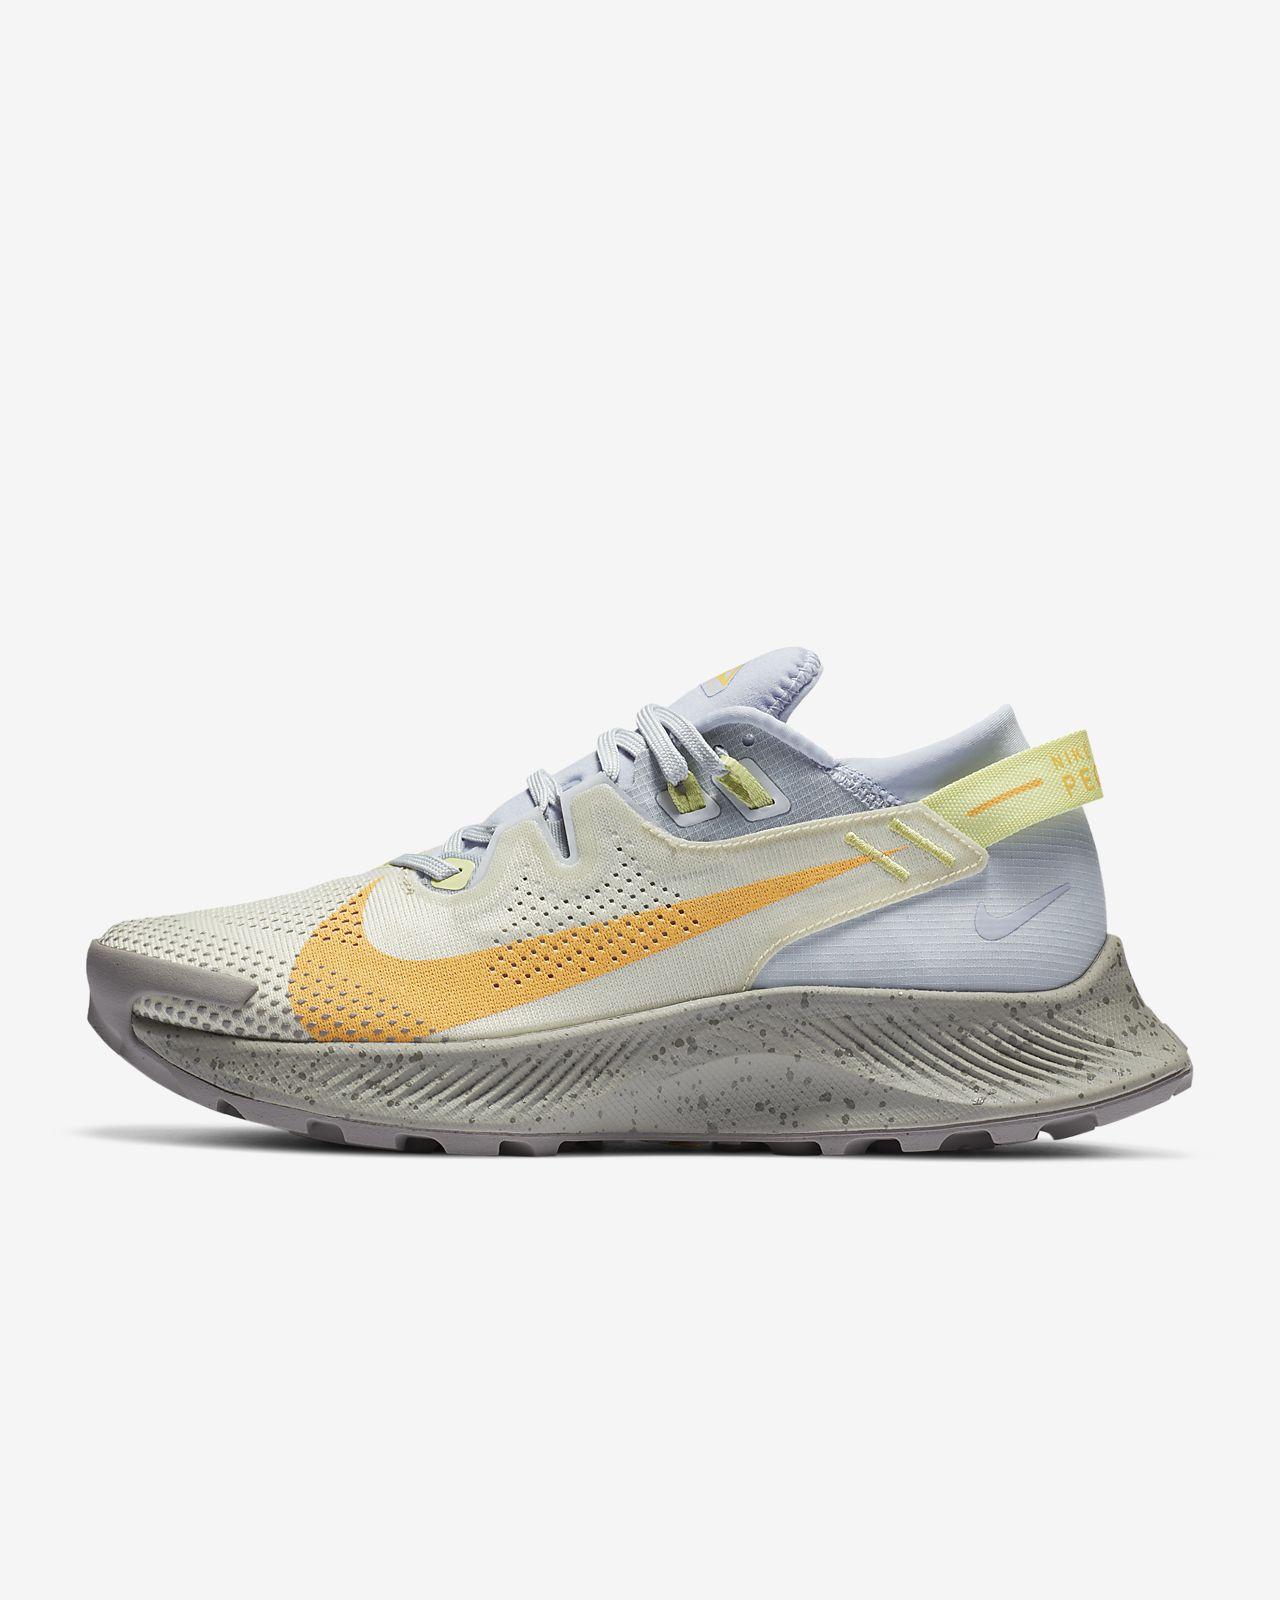 Nike Pegasus Trail 2 Women's Trail Running Shoe